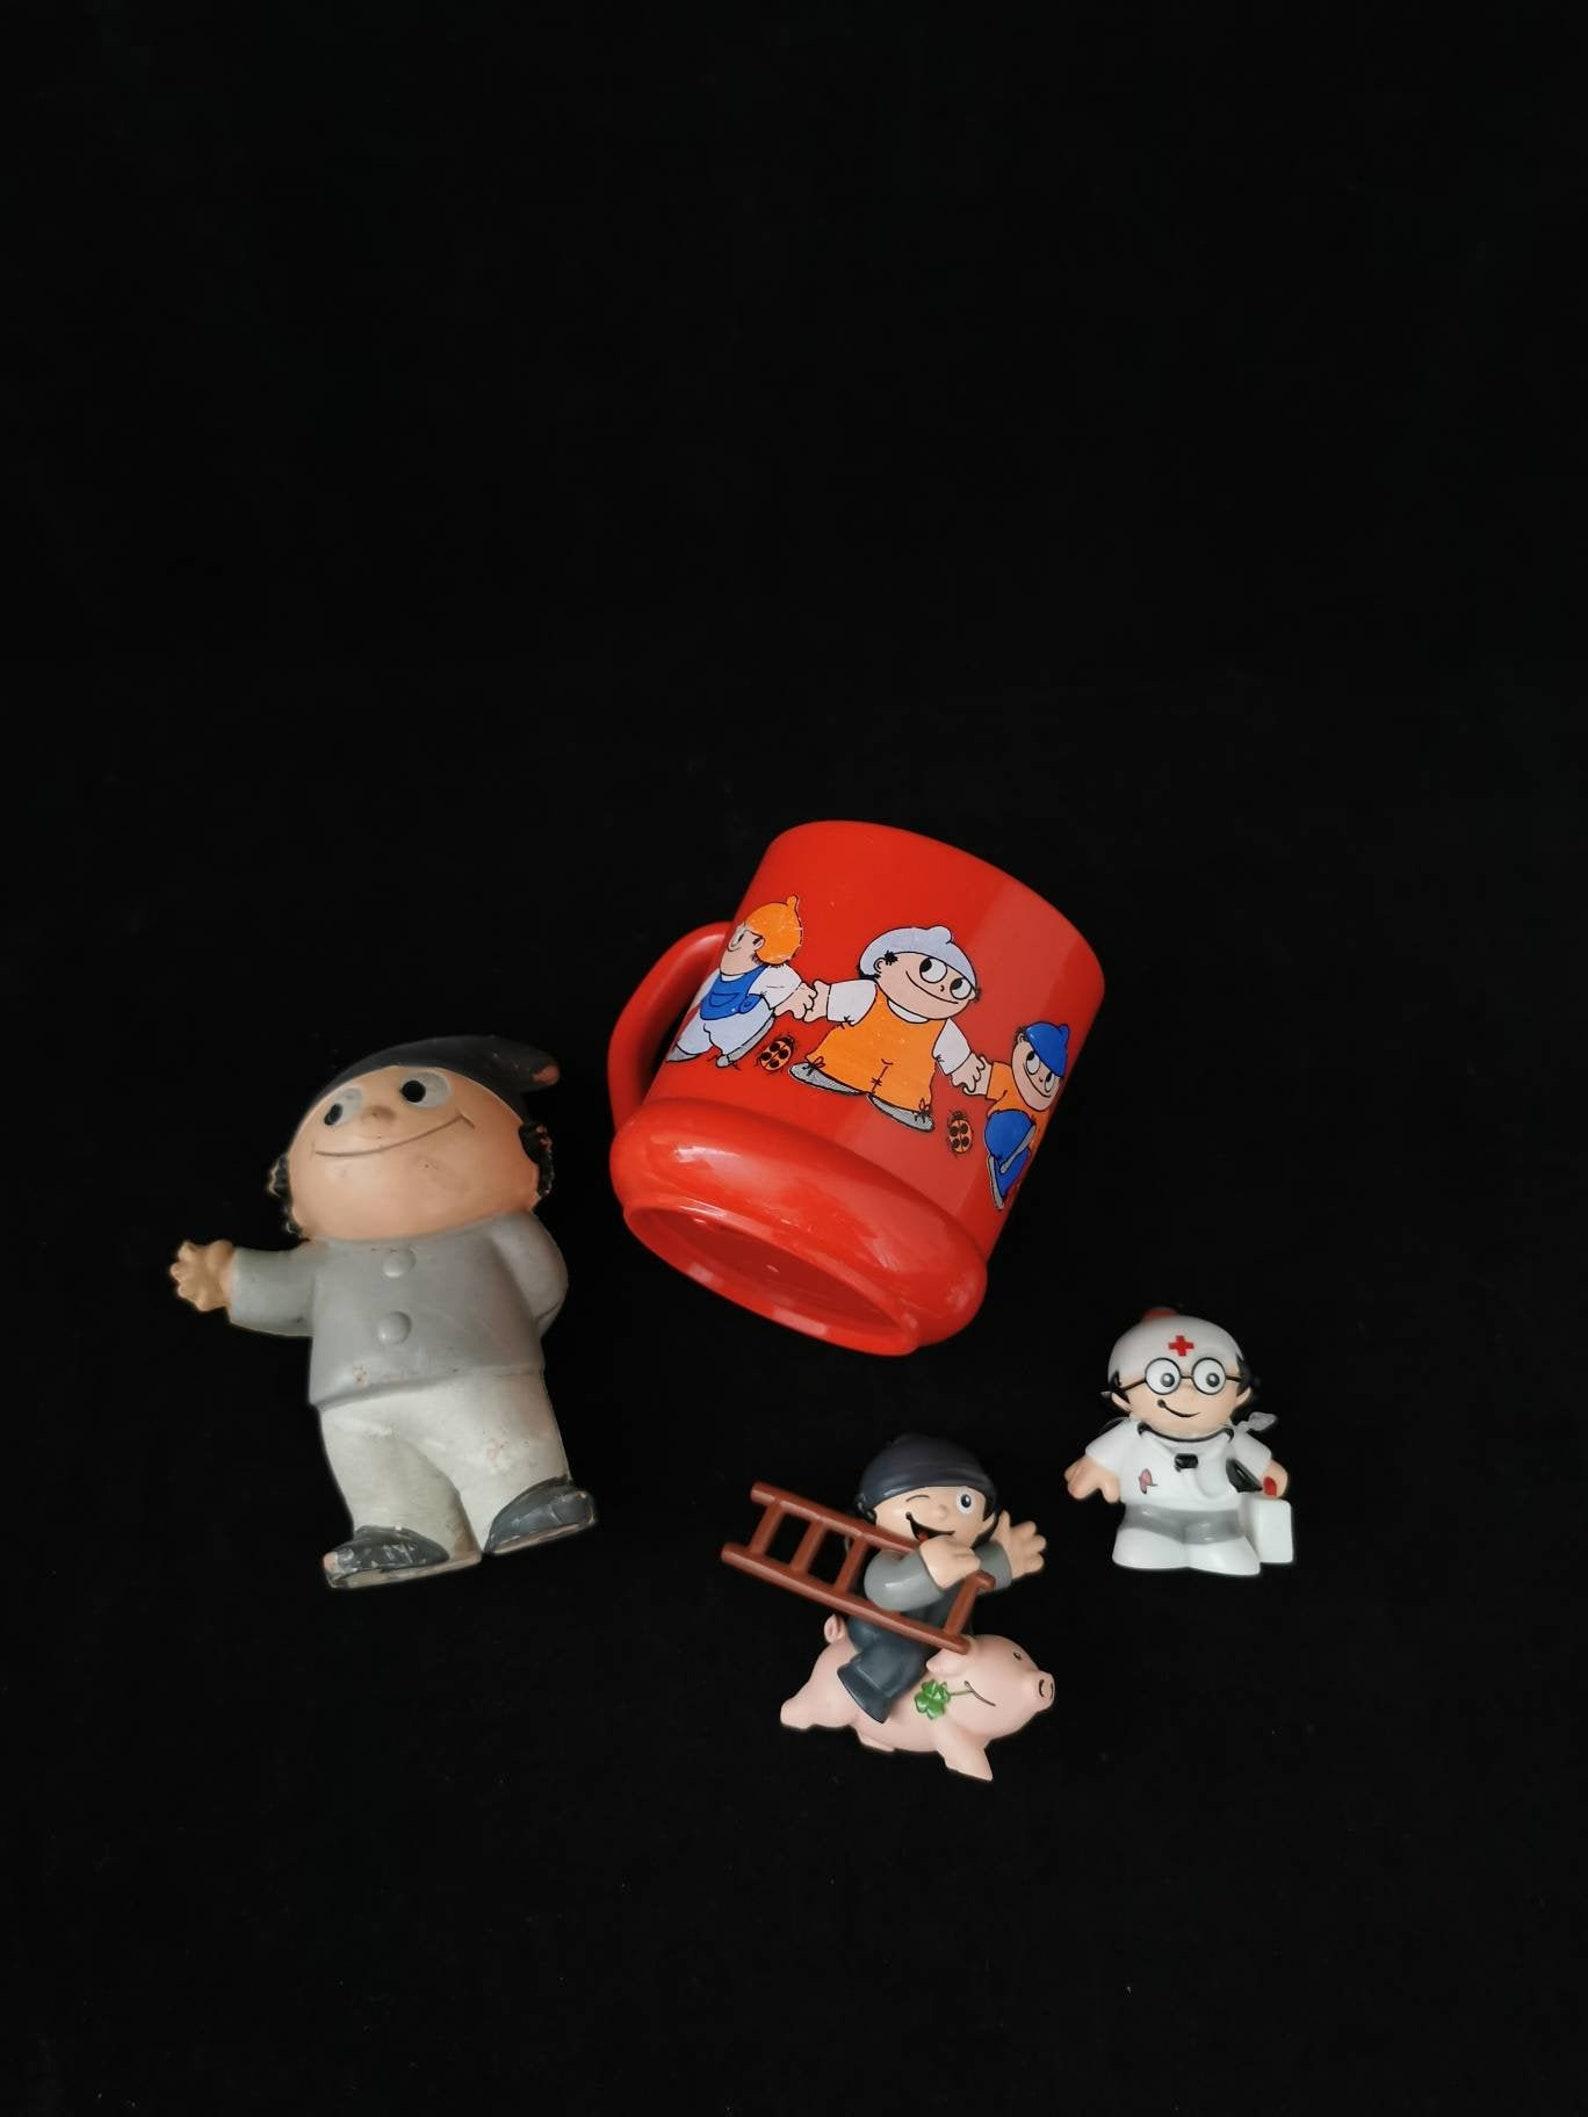 Mainzelmännchen Cup Mug ZDF 200ml West Germany Plastic 80s Set Collector